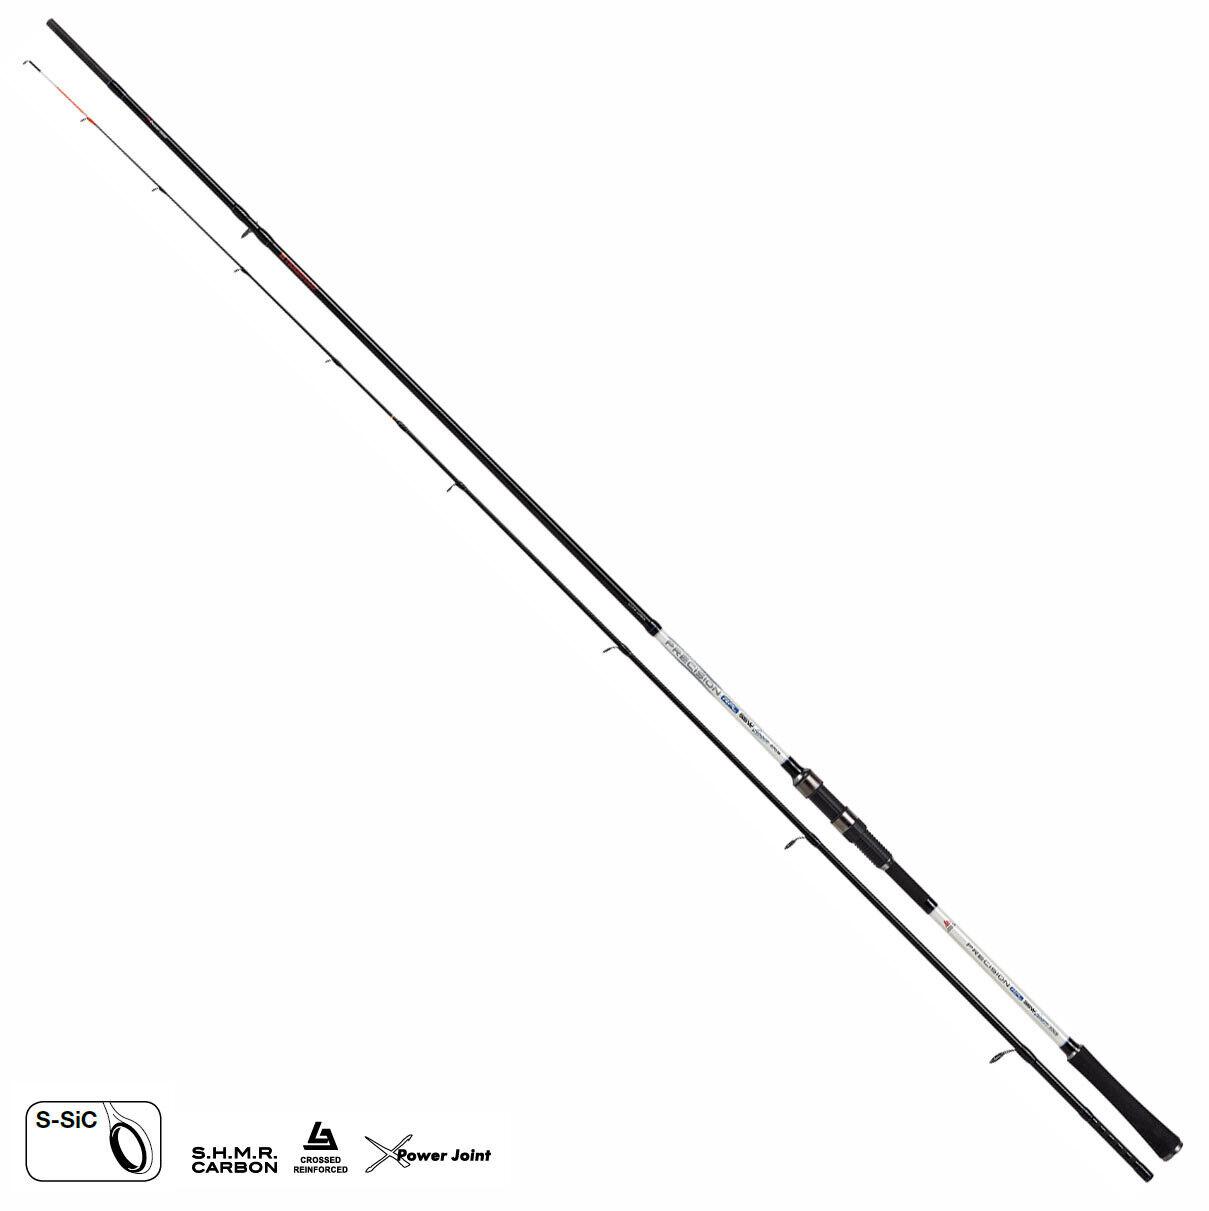 15220300 Canna Pesca Feeder Trabucco Precision RPL SSW  Sensor 3 m   FEU  artículos de promoción